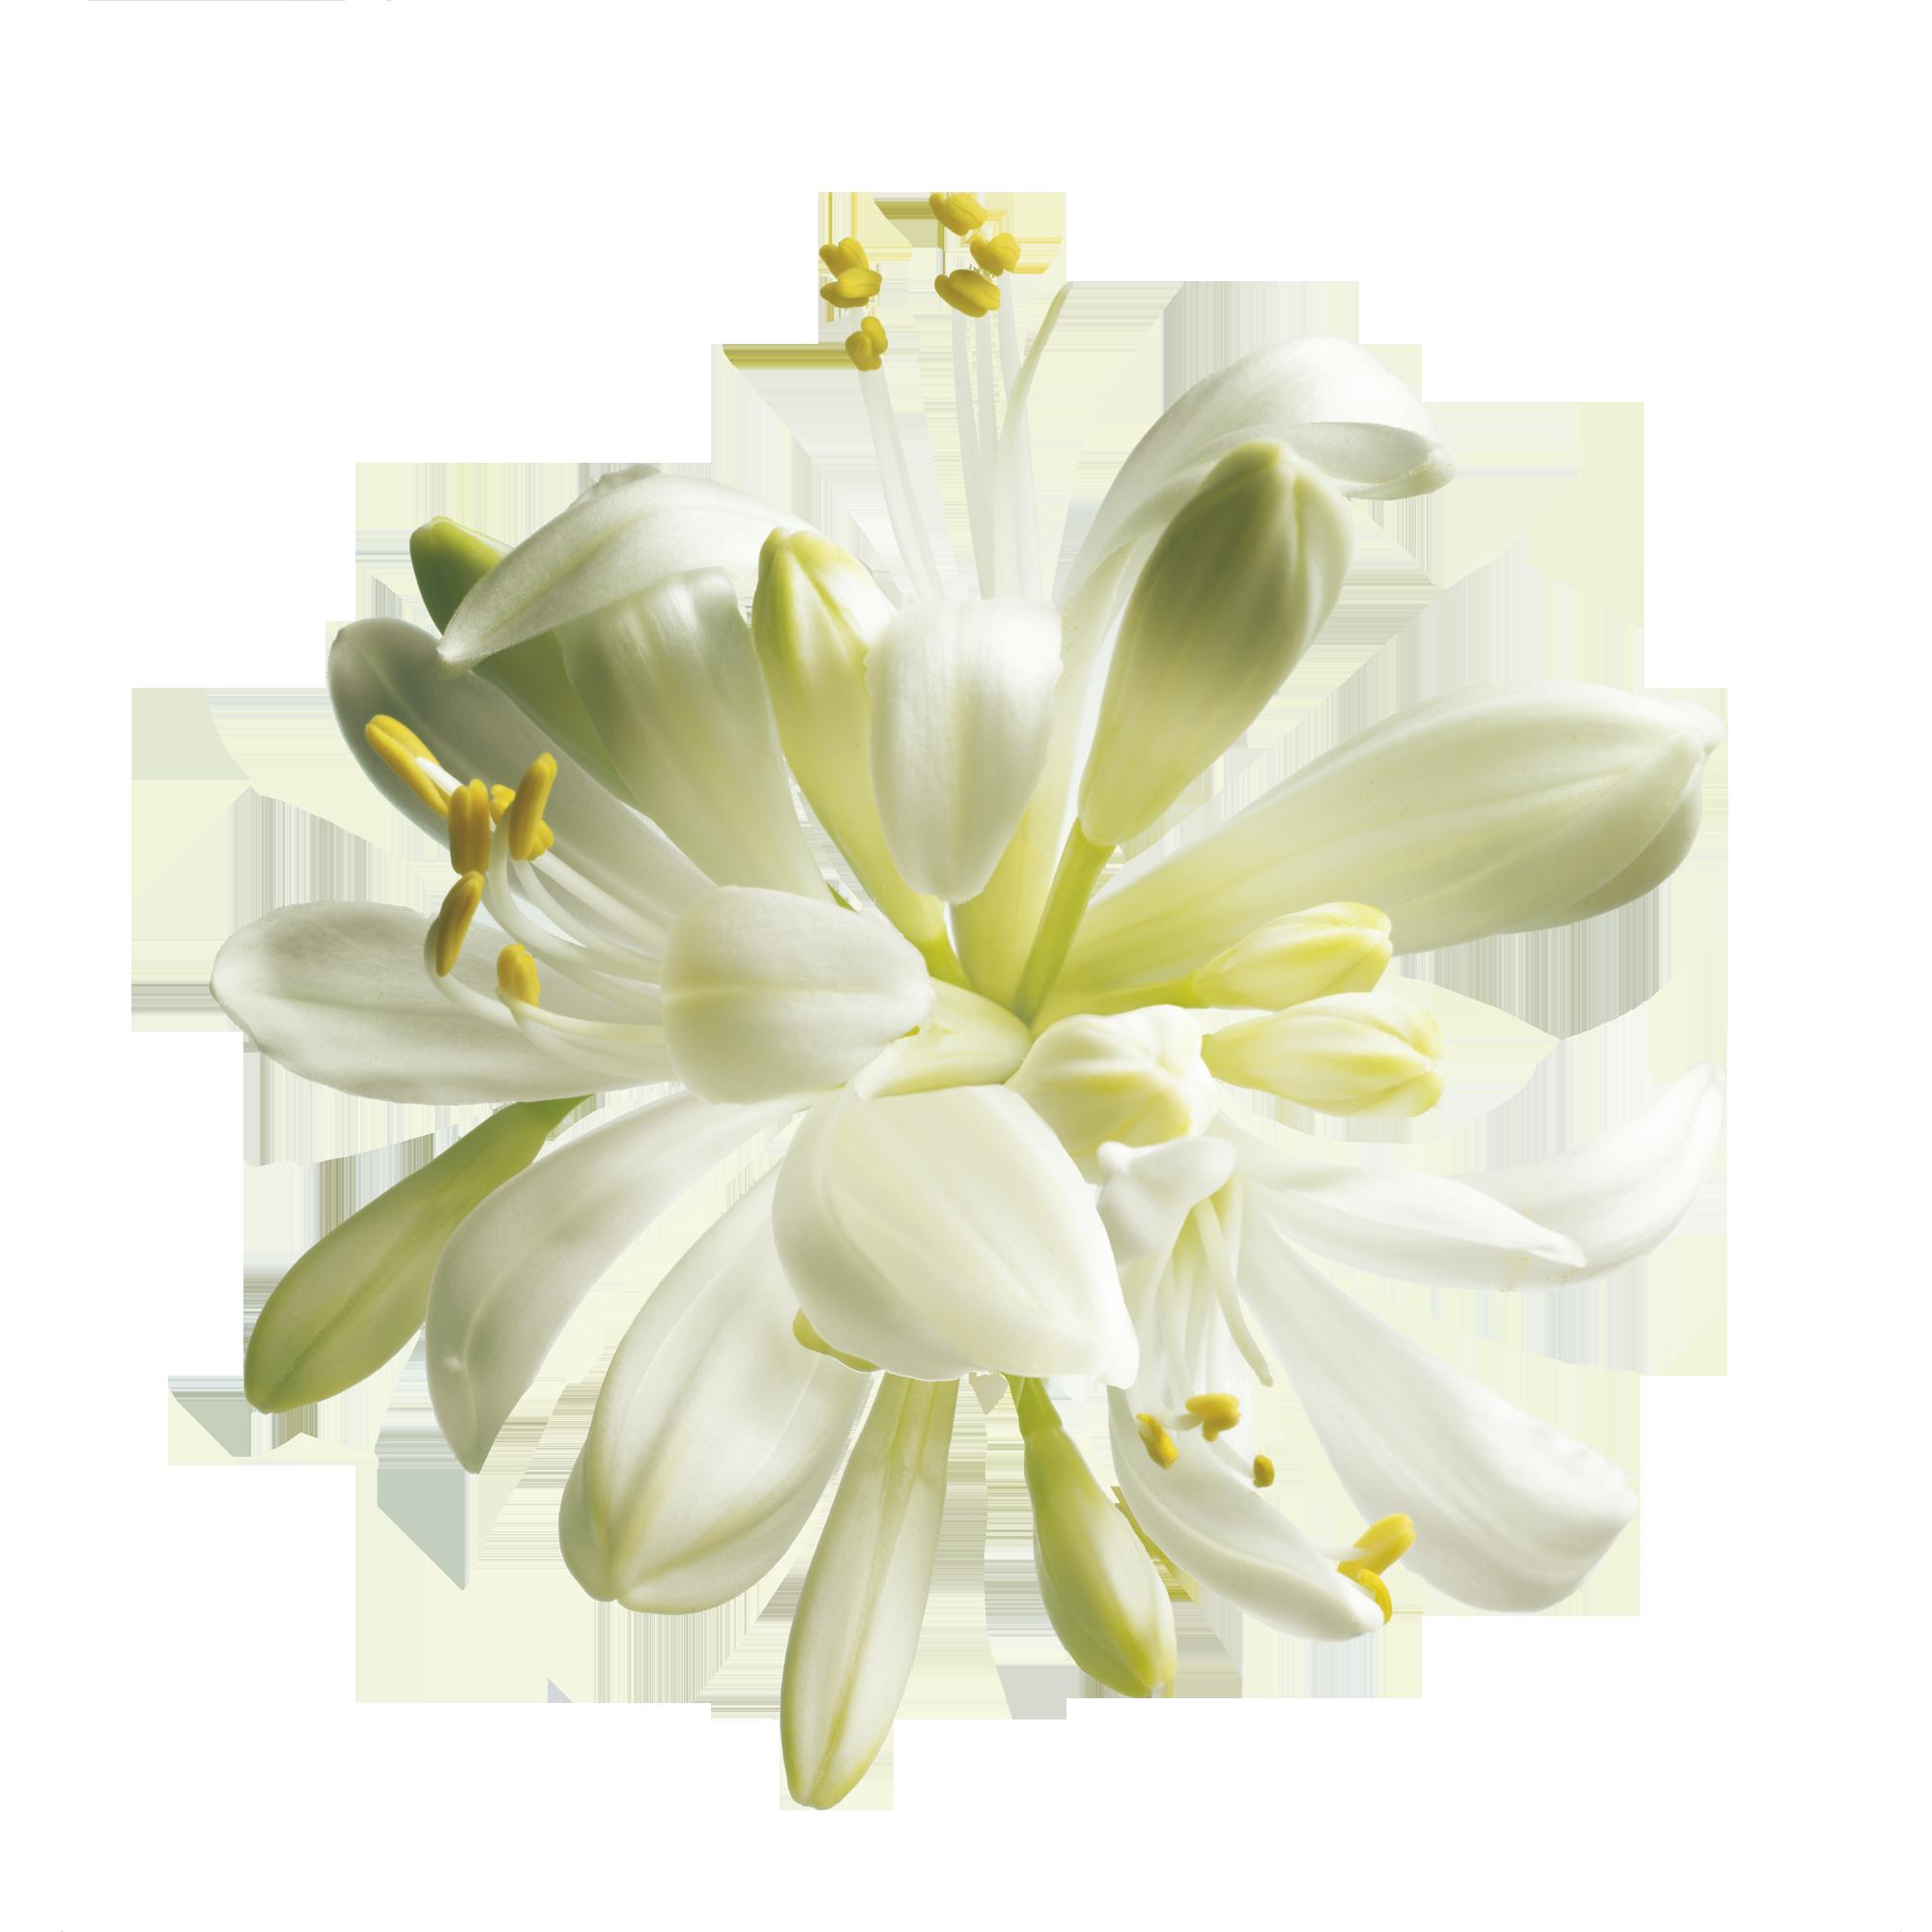 Rooibos flower clipart svg transparent download Moringa #TheBodyShop | Tree of Life | Pinterest | Flowers, Gardens ... svg transparent download